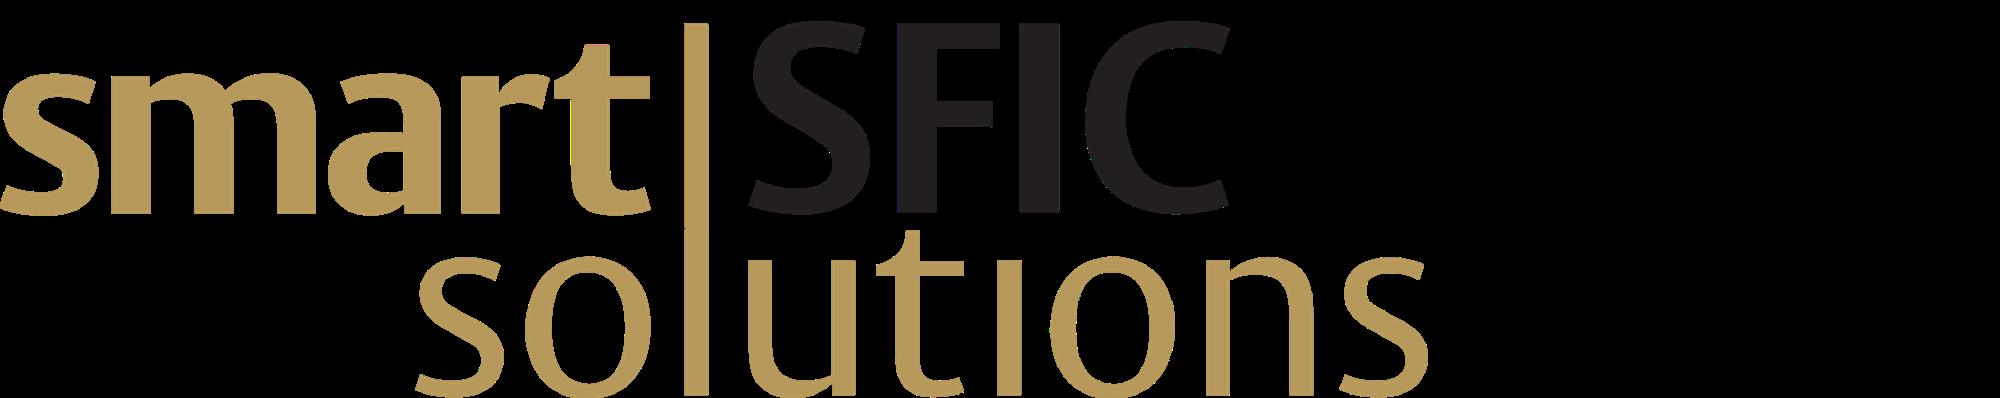 SmartSFIC.png